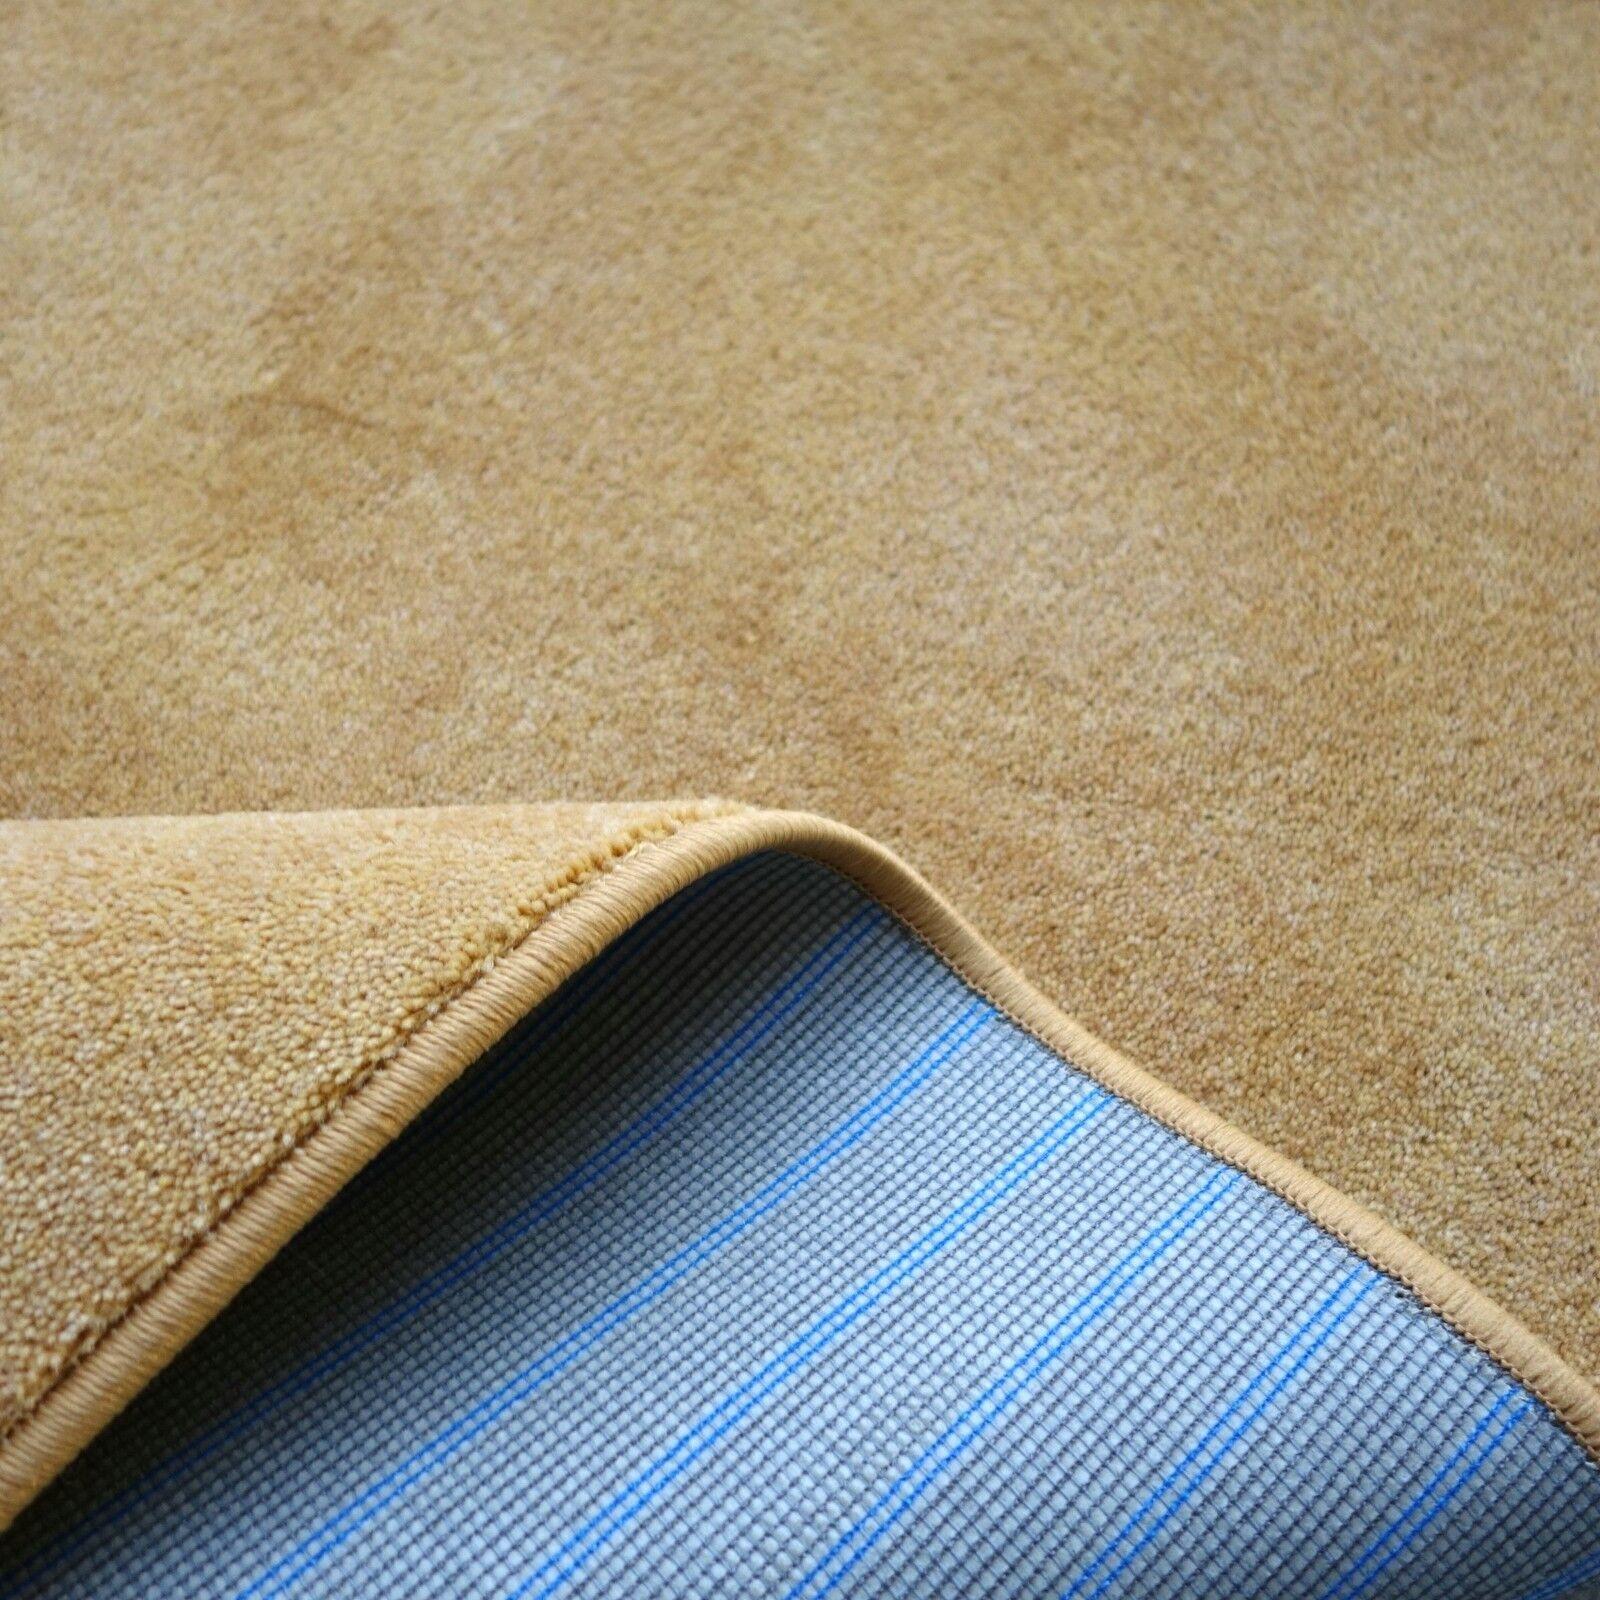 tapis svitex m diterran e fron age velours marbr avec arri re de textile ebay. Black Bedroom Furniture Sets. Home Design Ideas